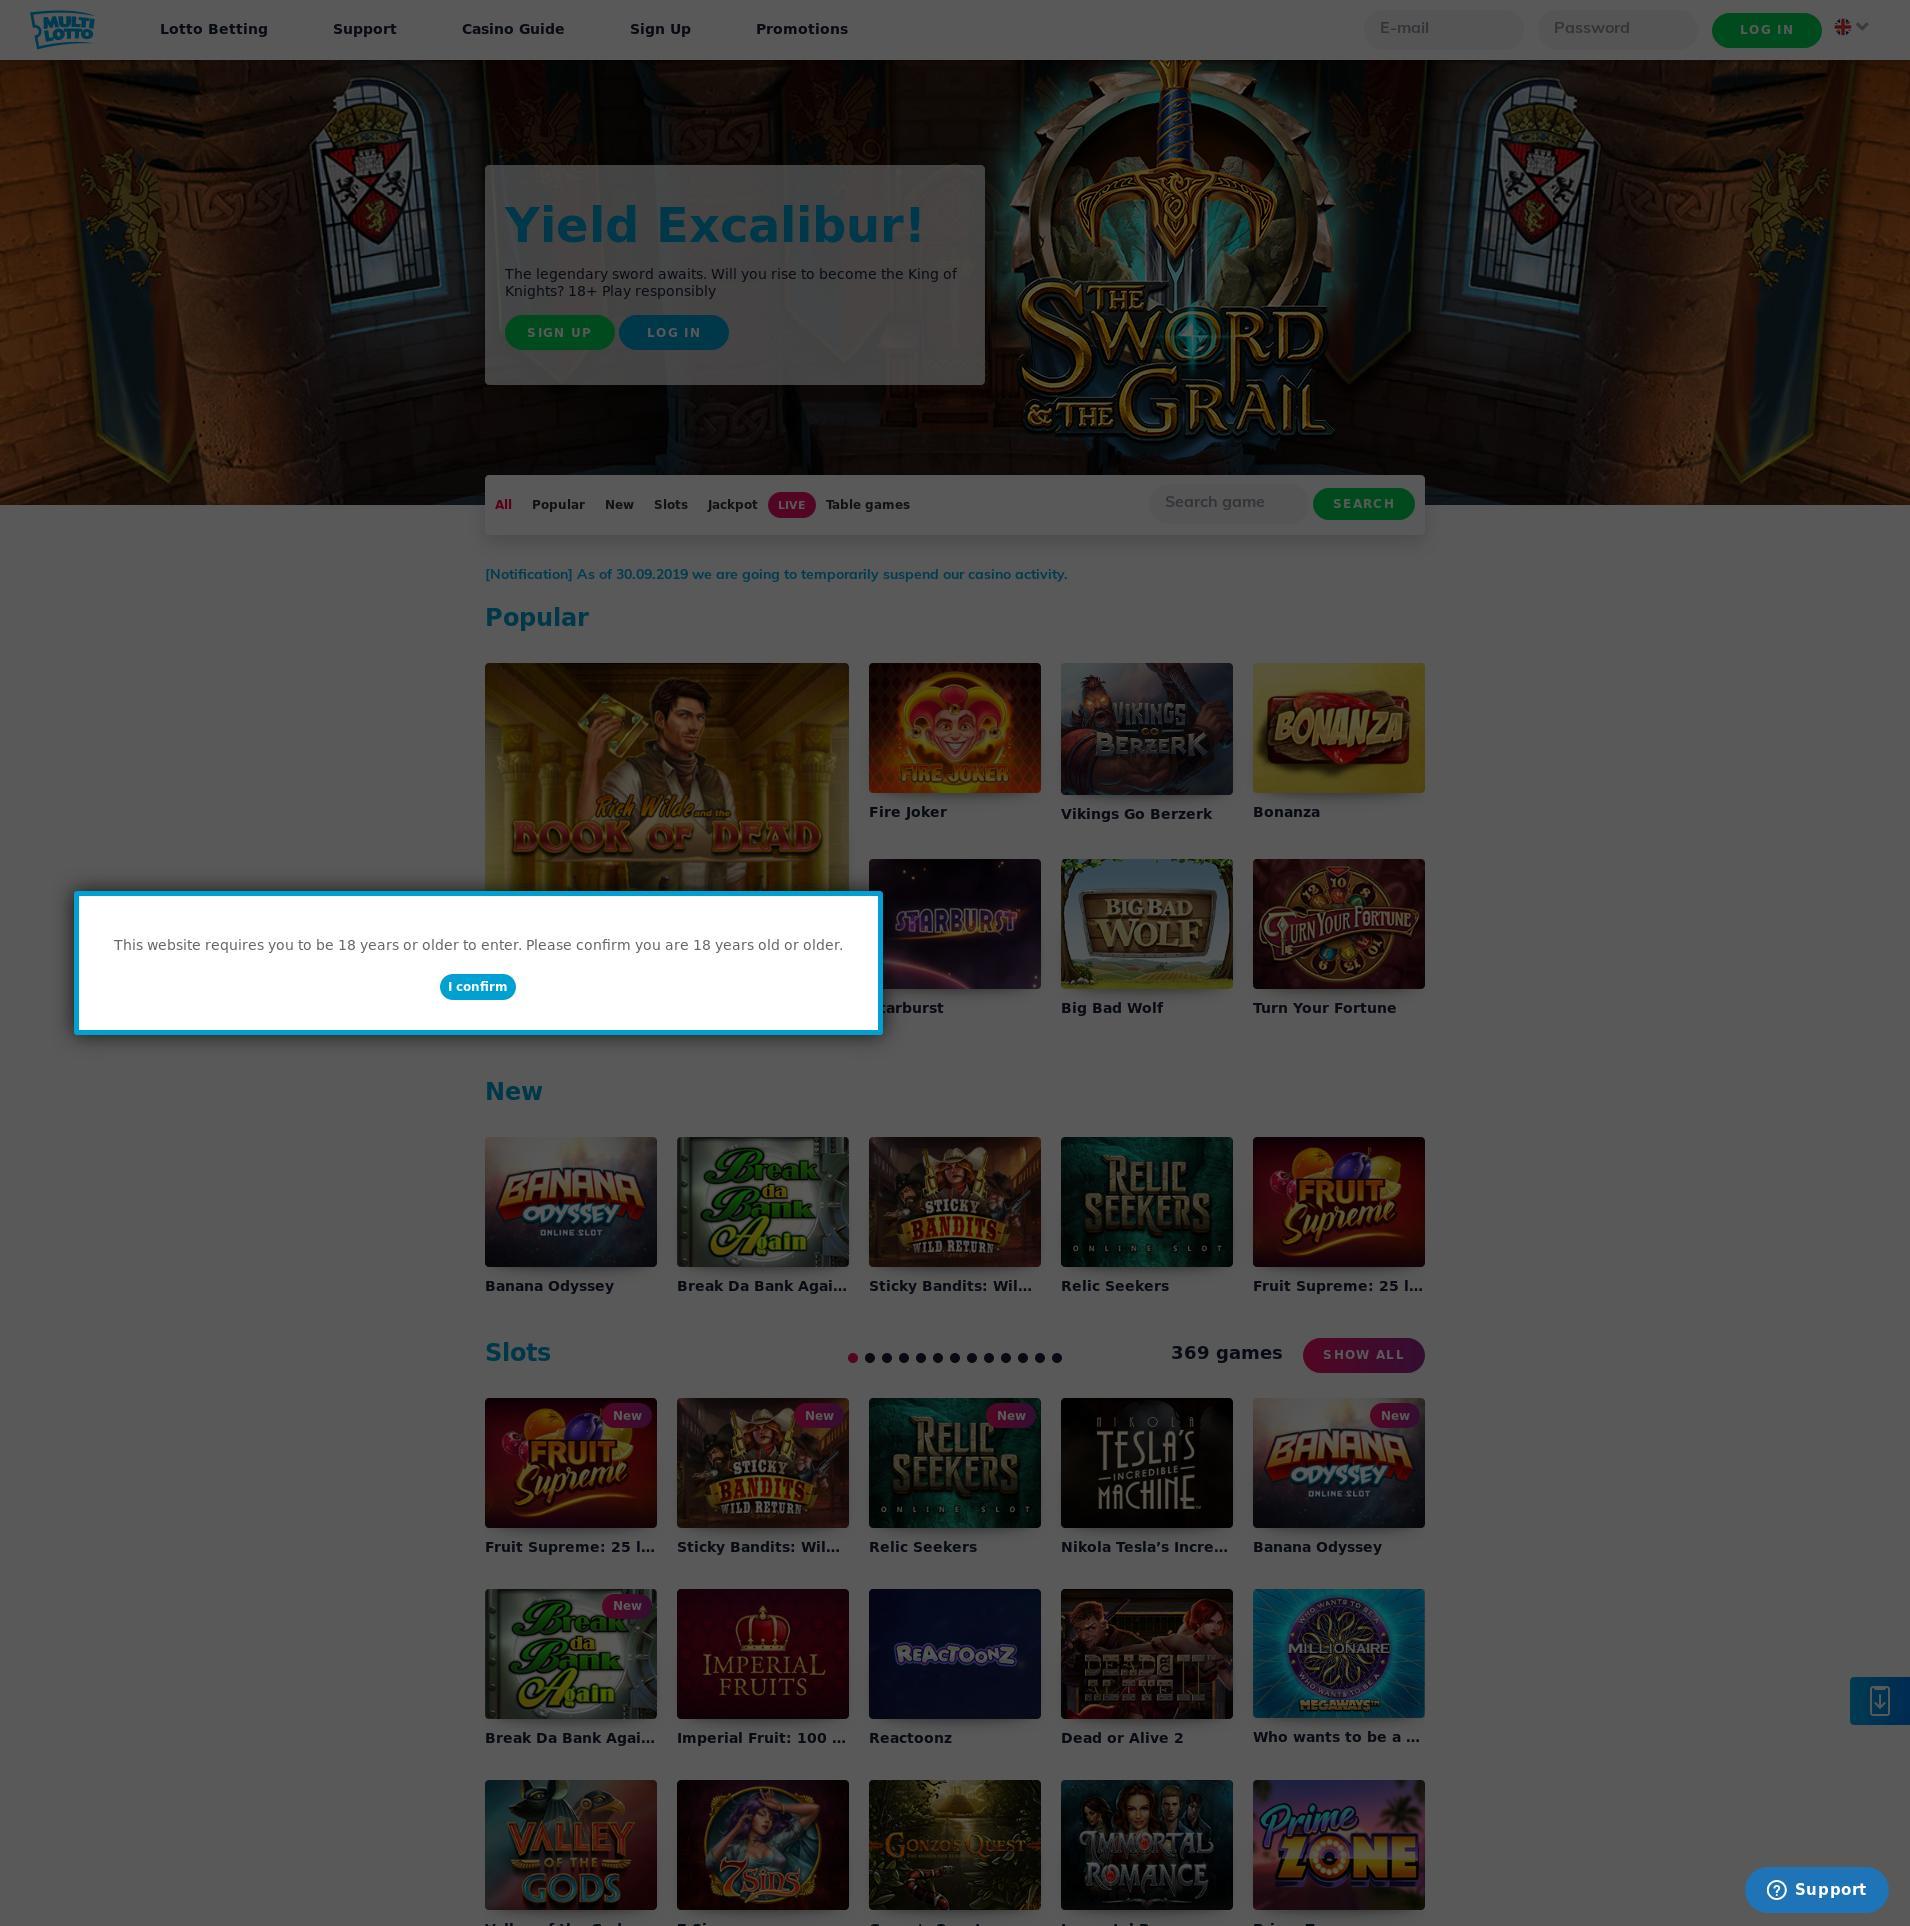 Casino screen Lobby 2019-10-20 for United Kingdom